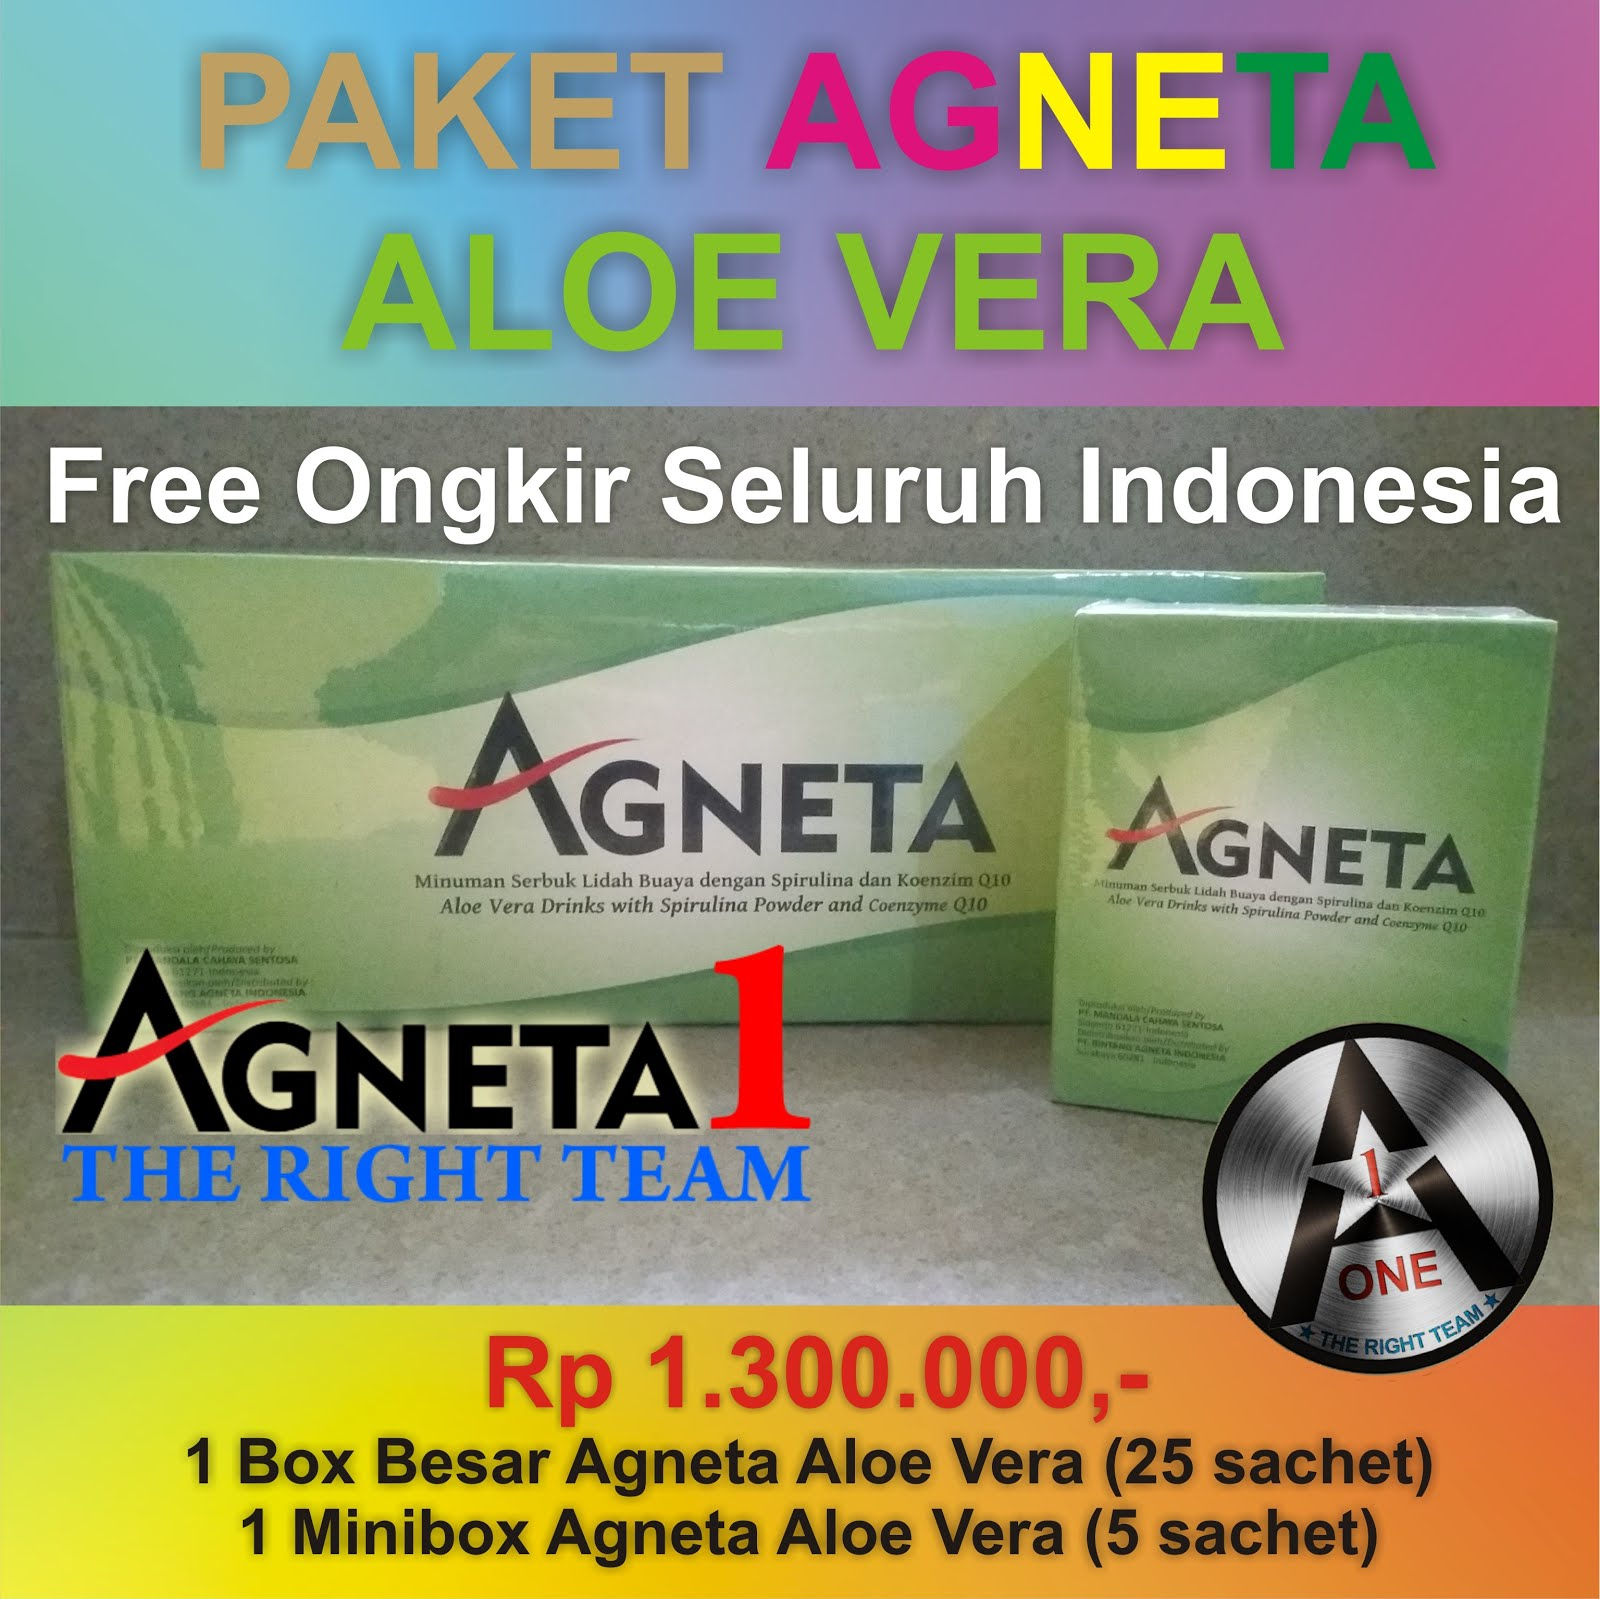 Paket Agneta Aloe Vera